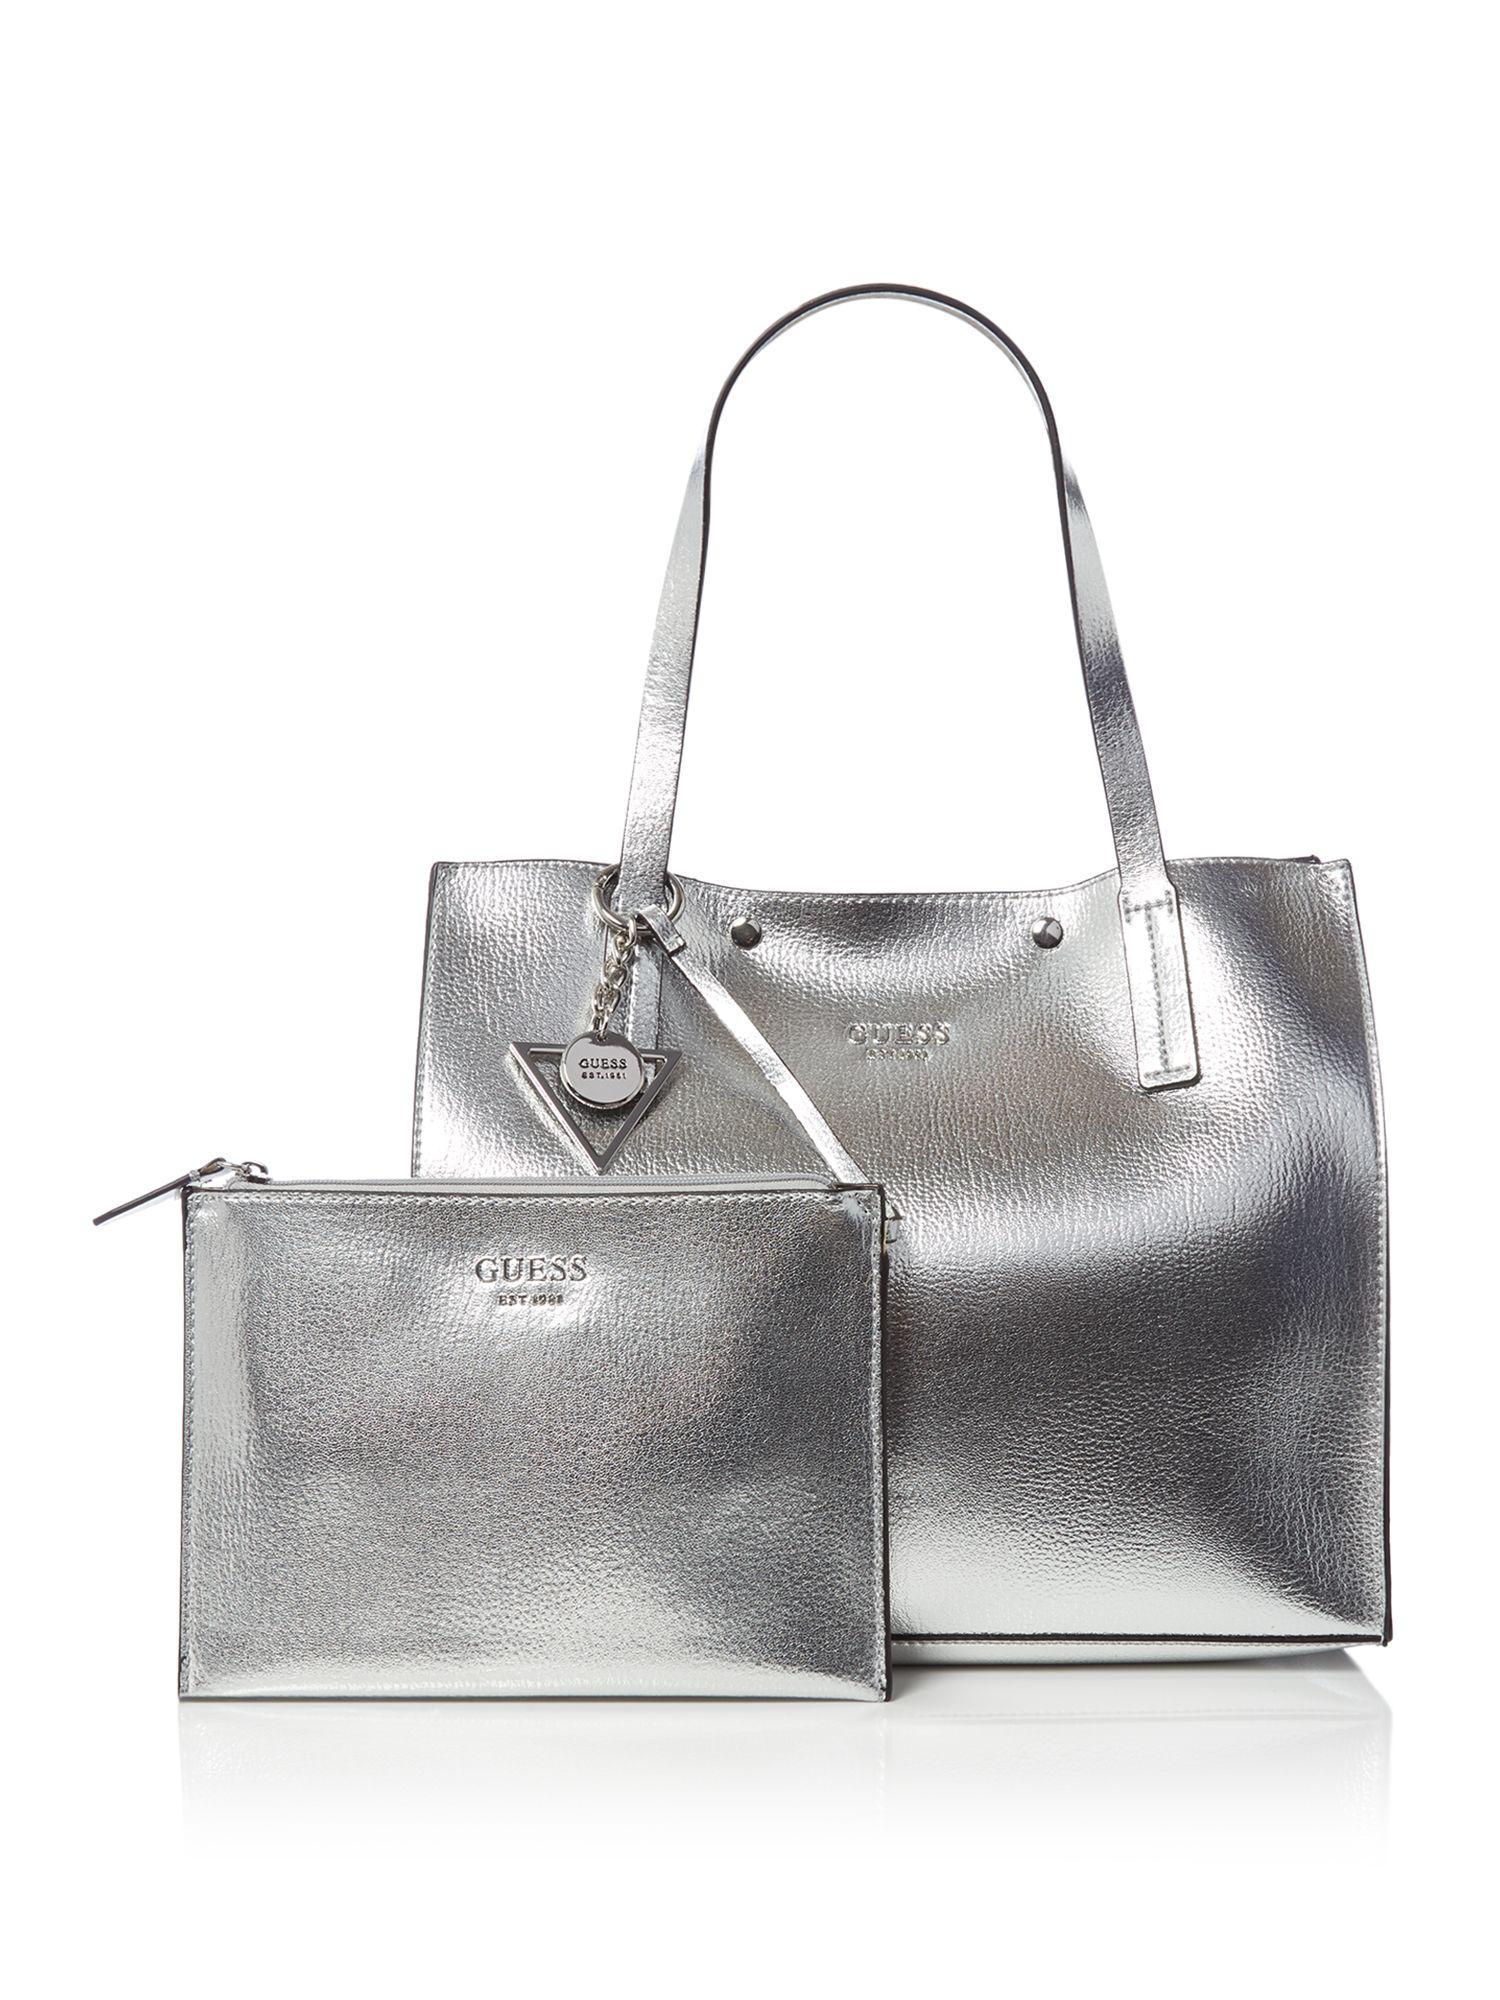 214ec070709e Guess Kinley Carryall Bag in Metallic - Lyst